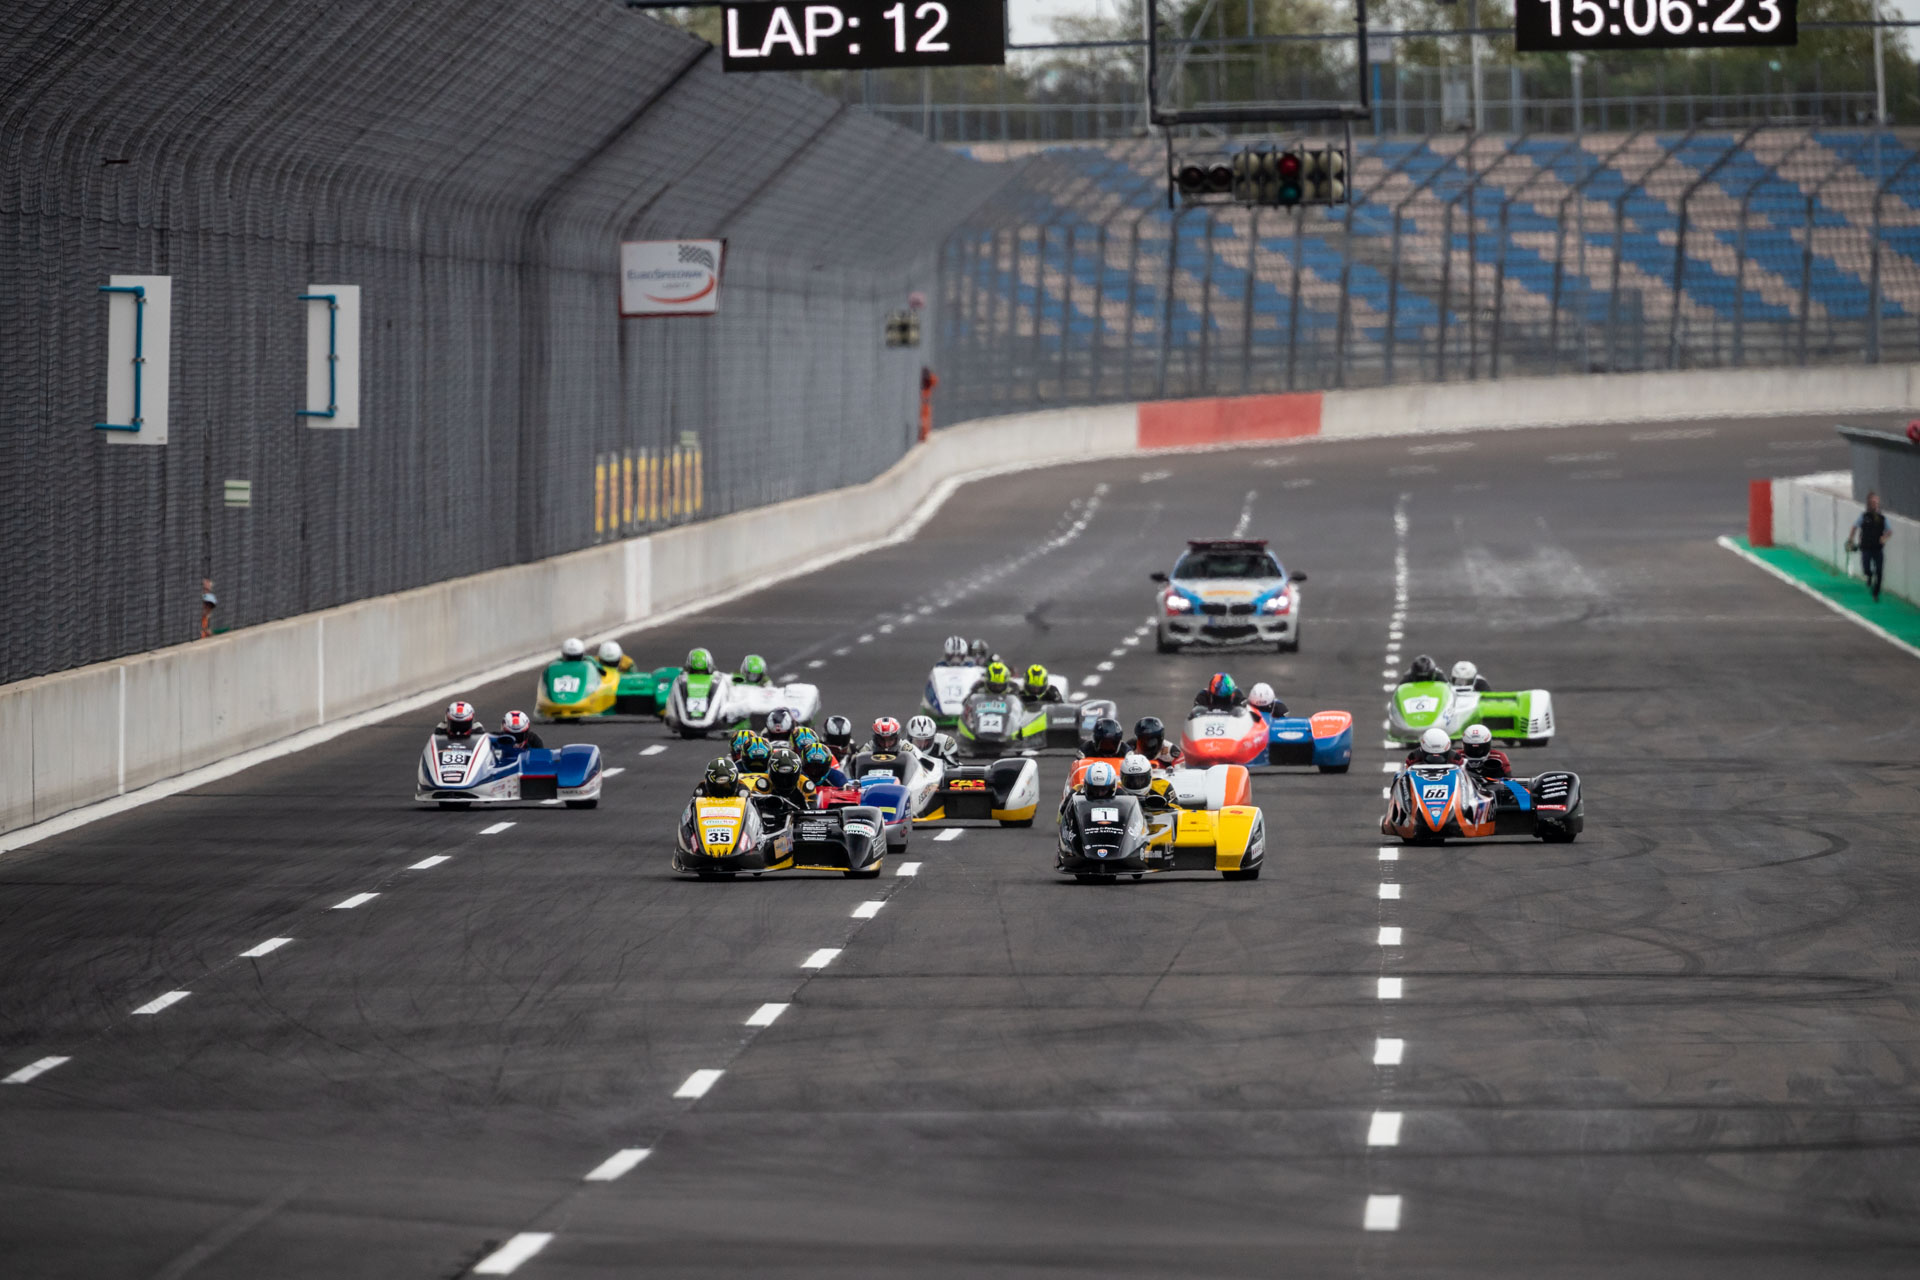 IDM_Lausitzring2018_Sidecars-Rennen1-web-4